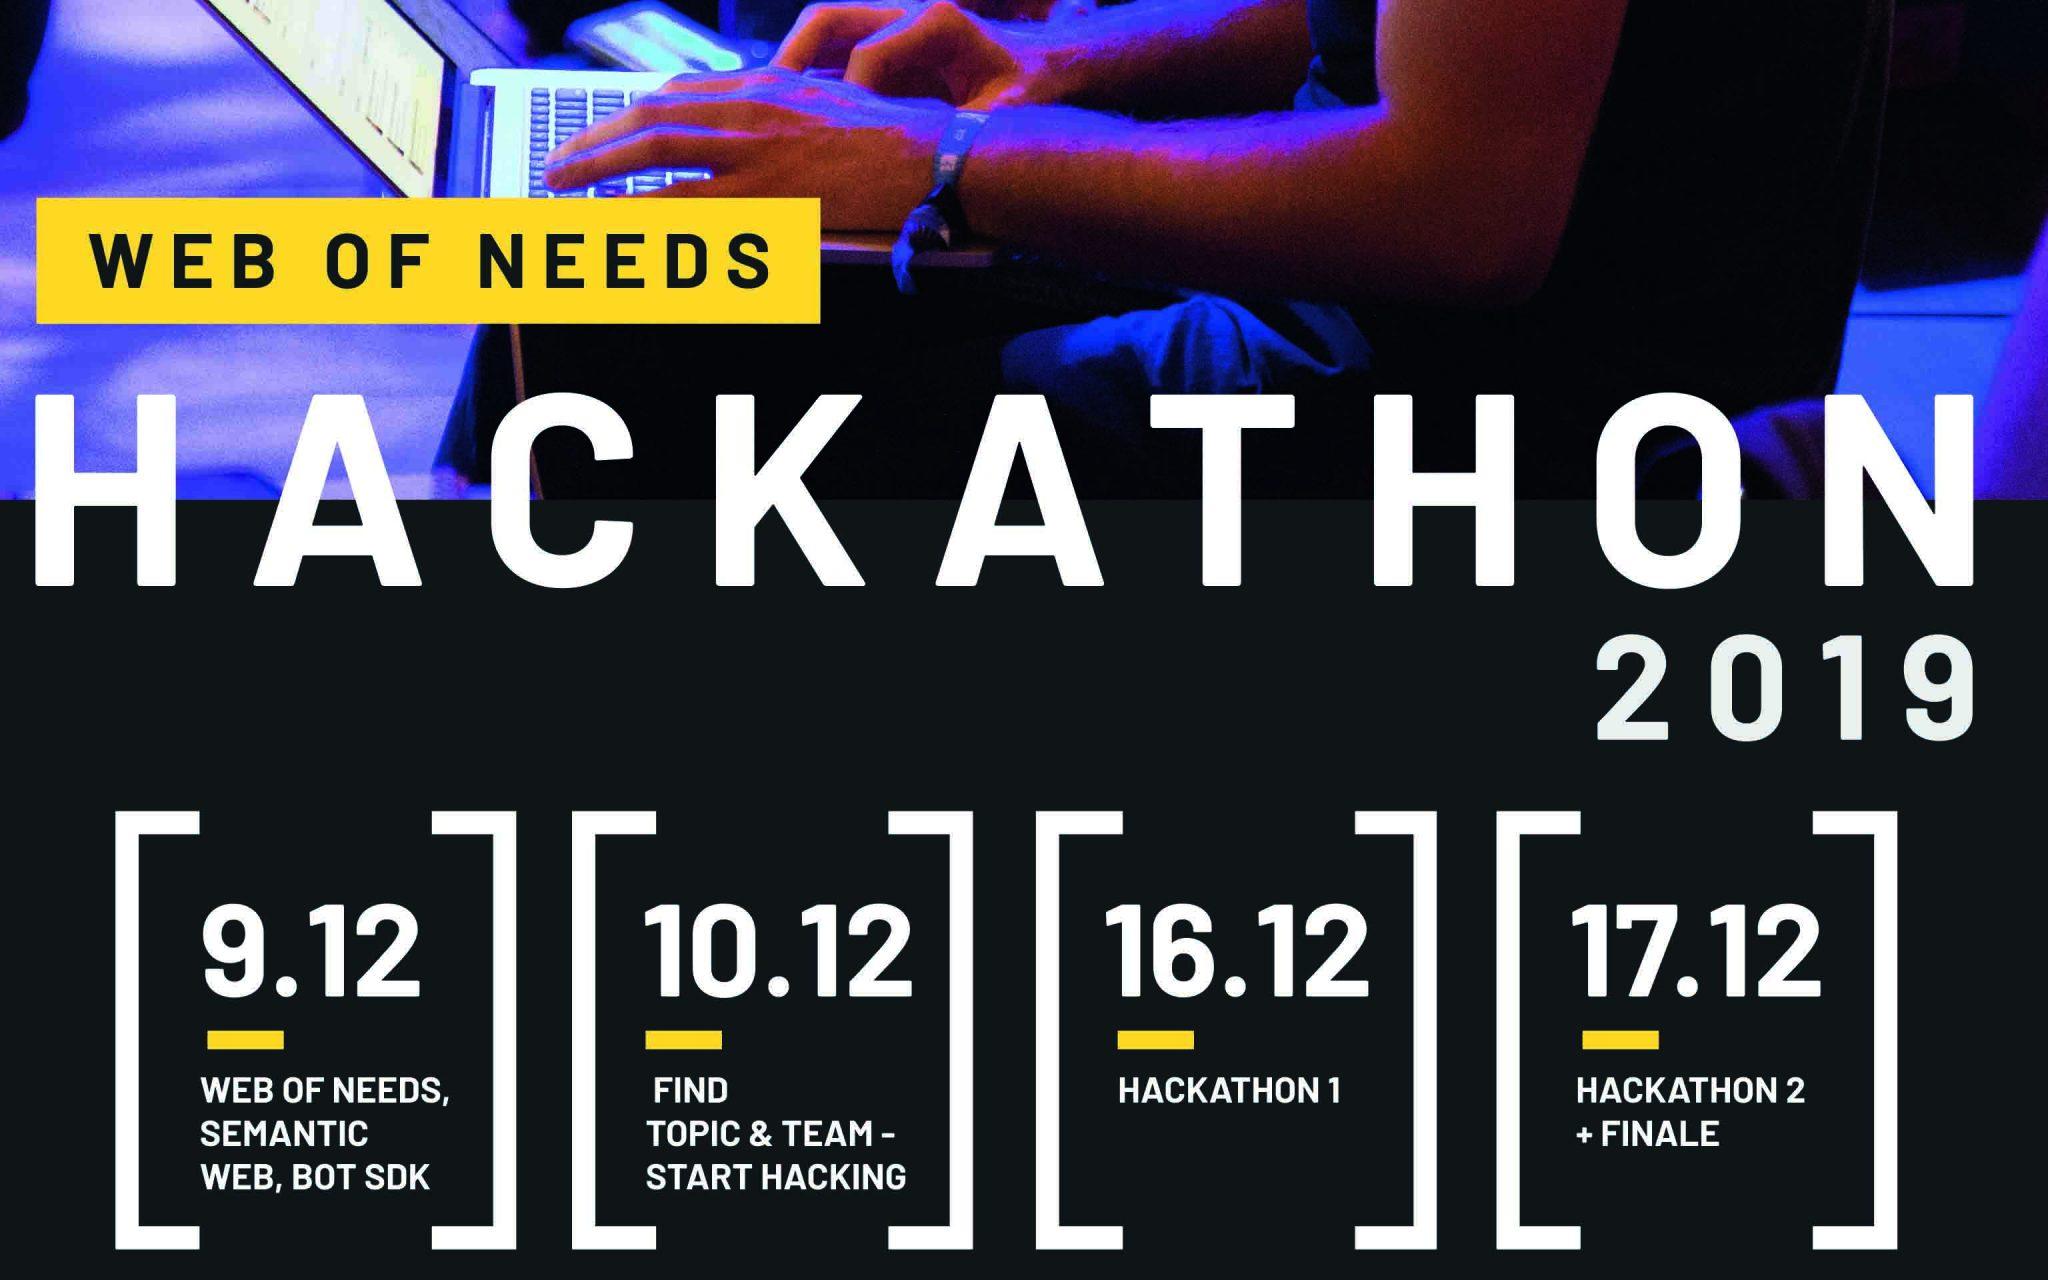 Web of Needs-Hackathon